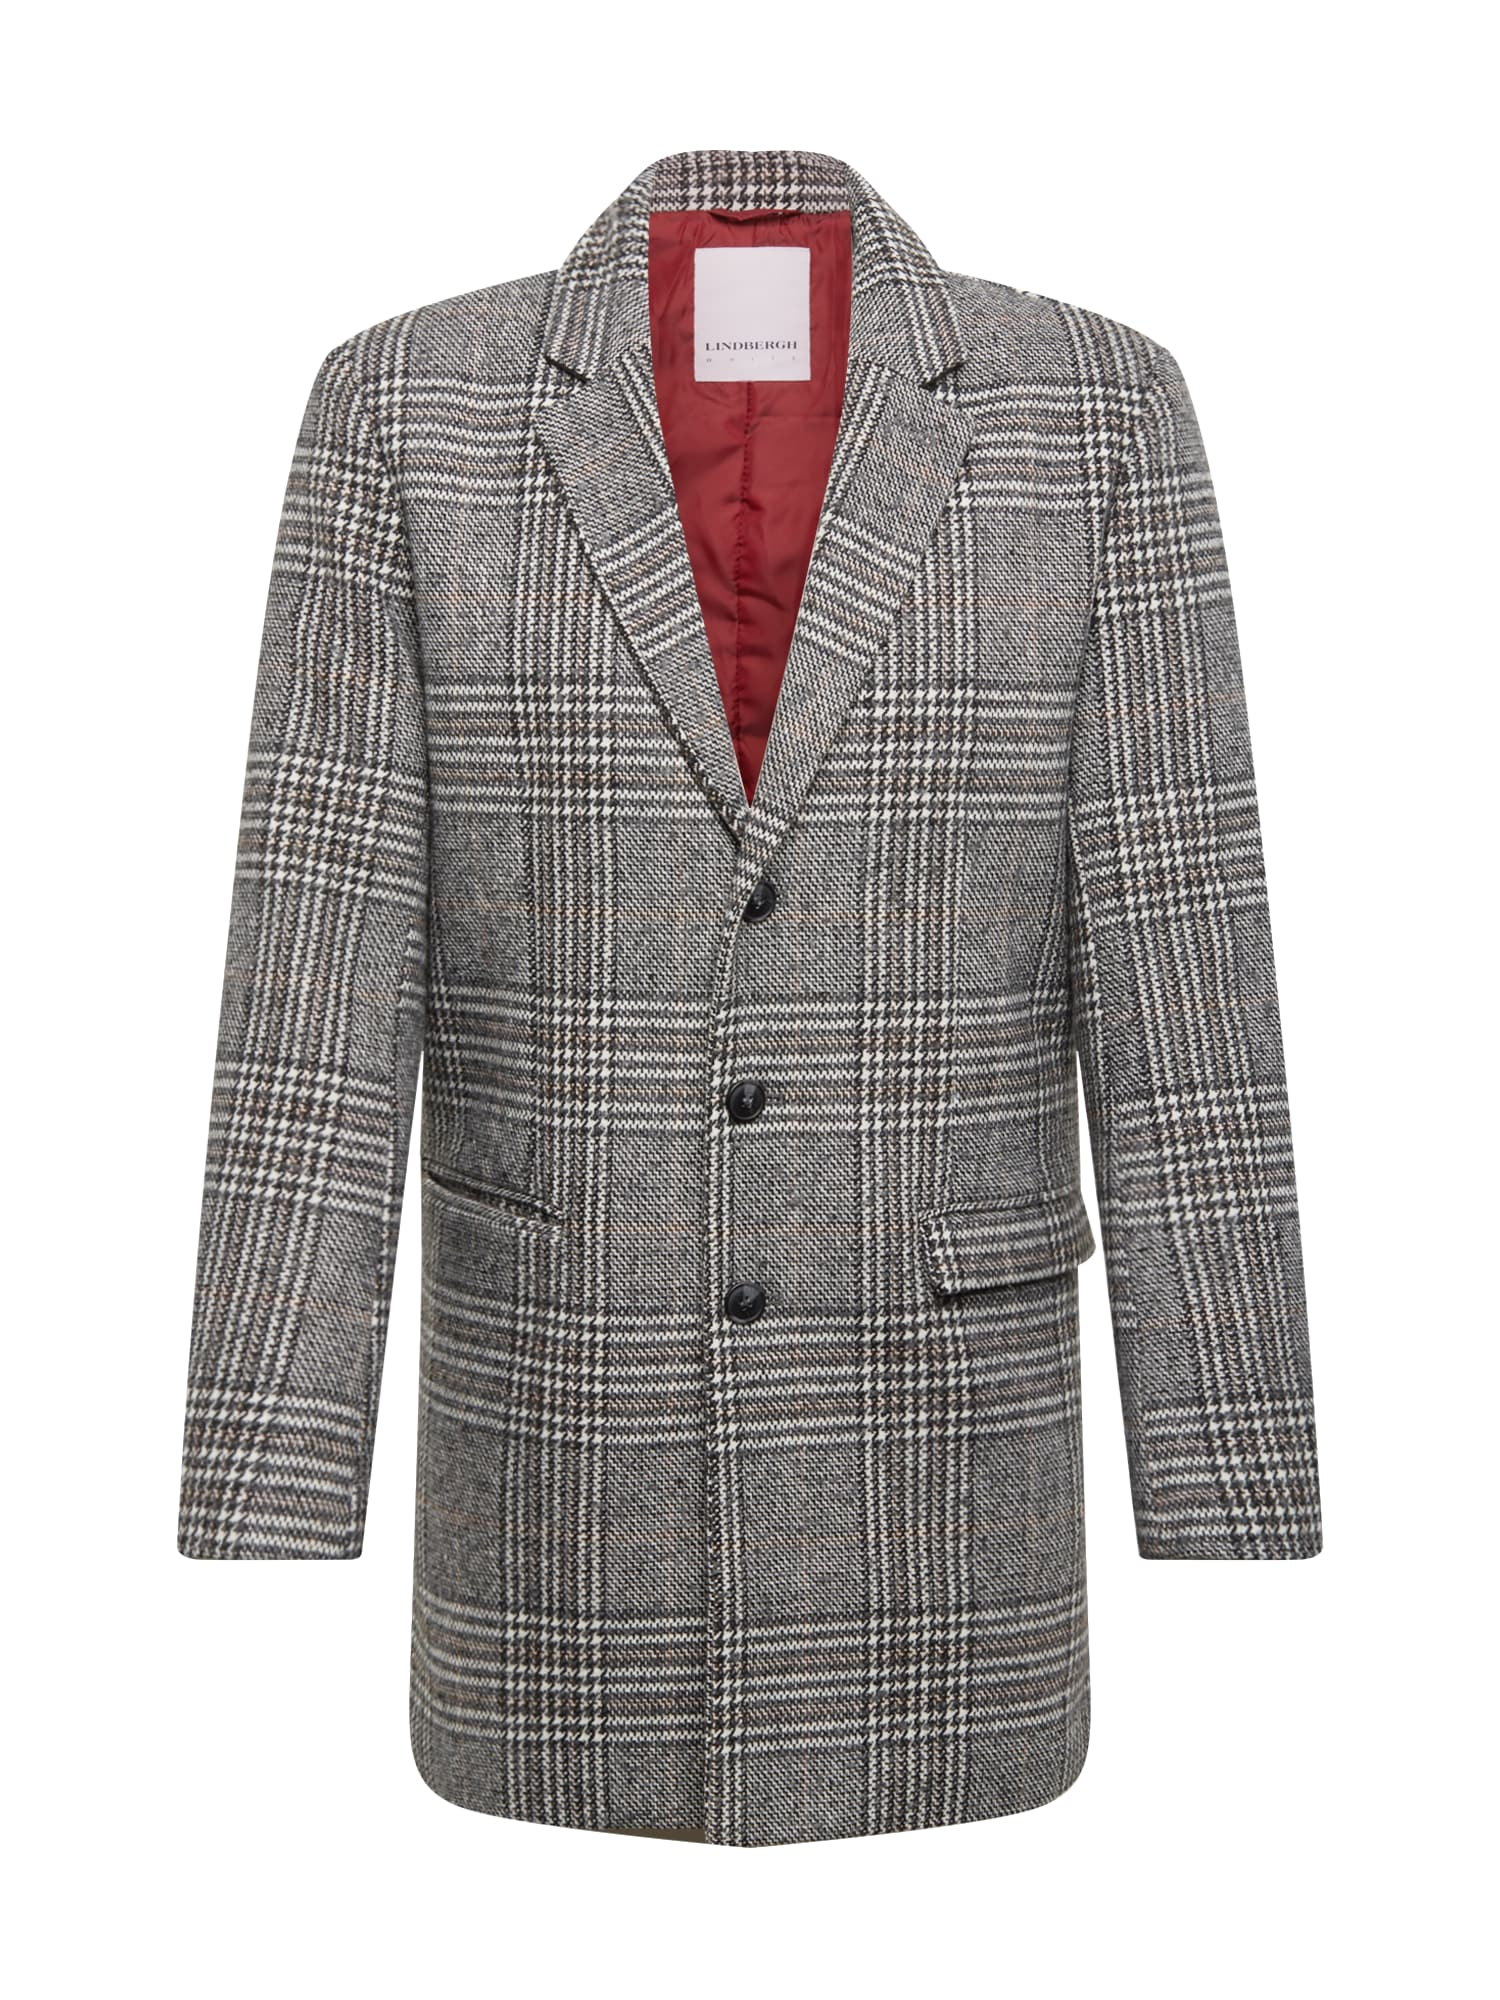 Lindbergh Rudeninis-žieminis paltas 'Checked coat' pilka